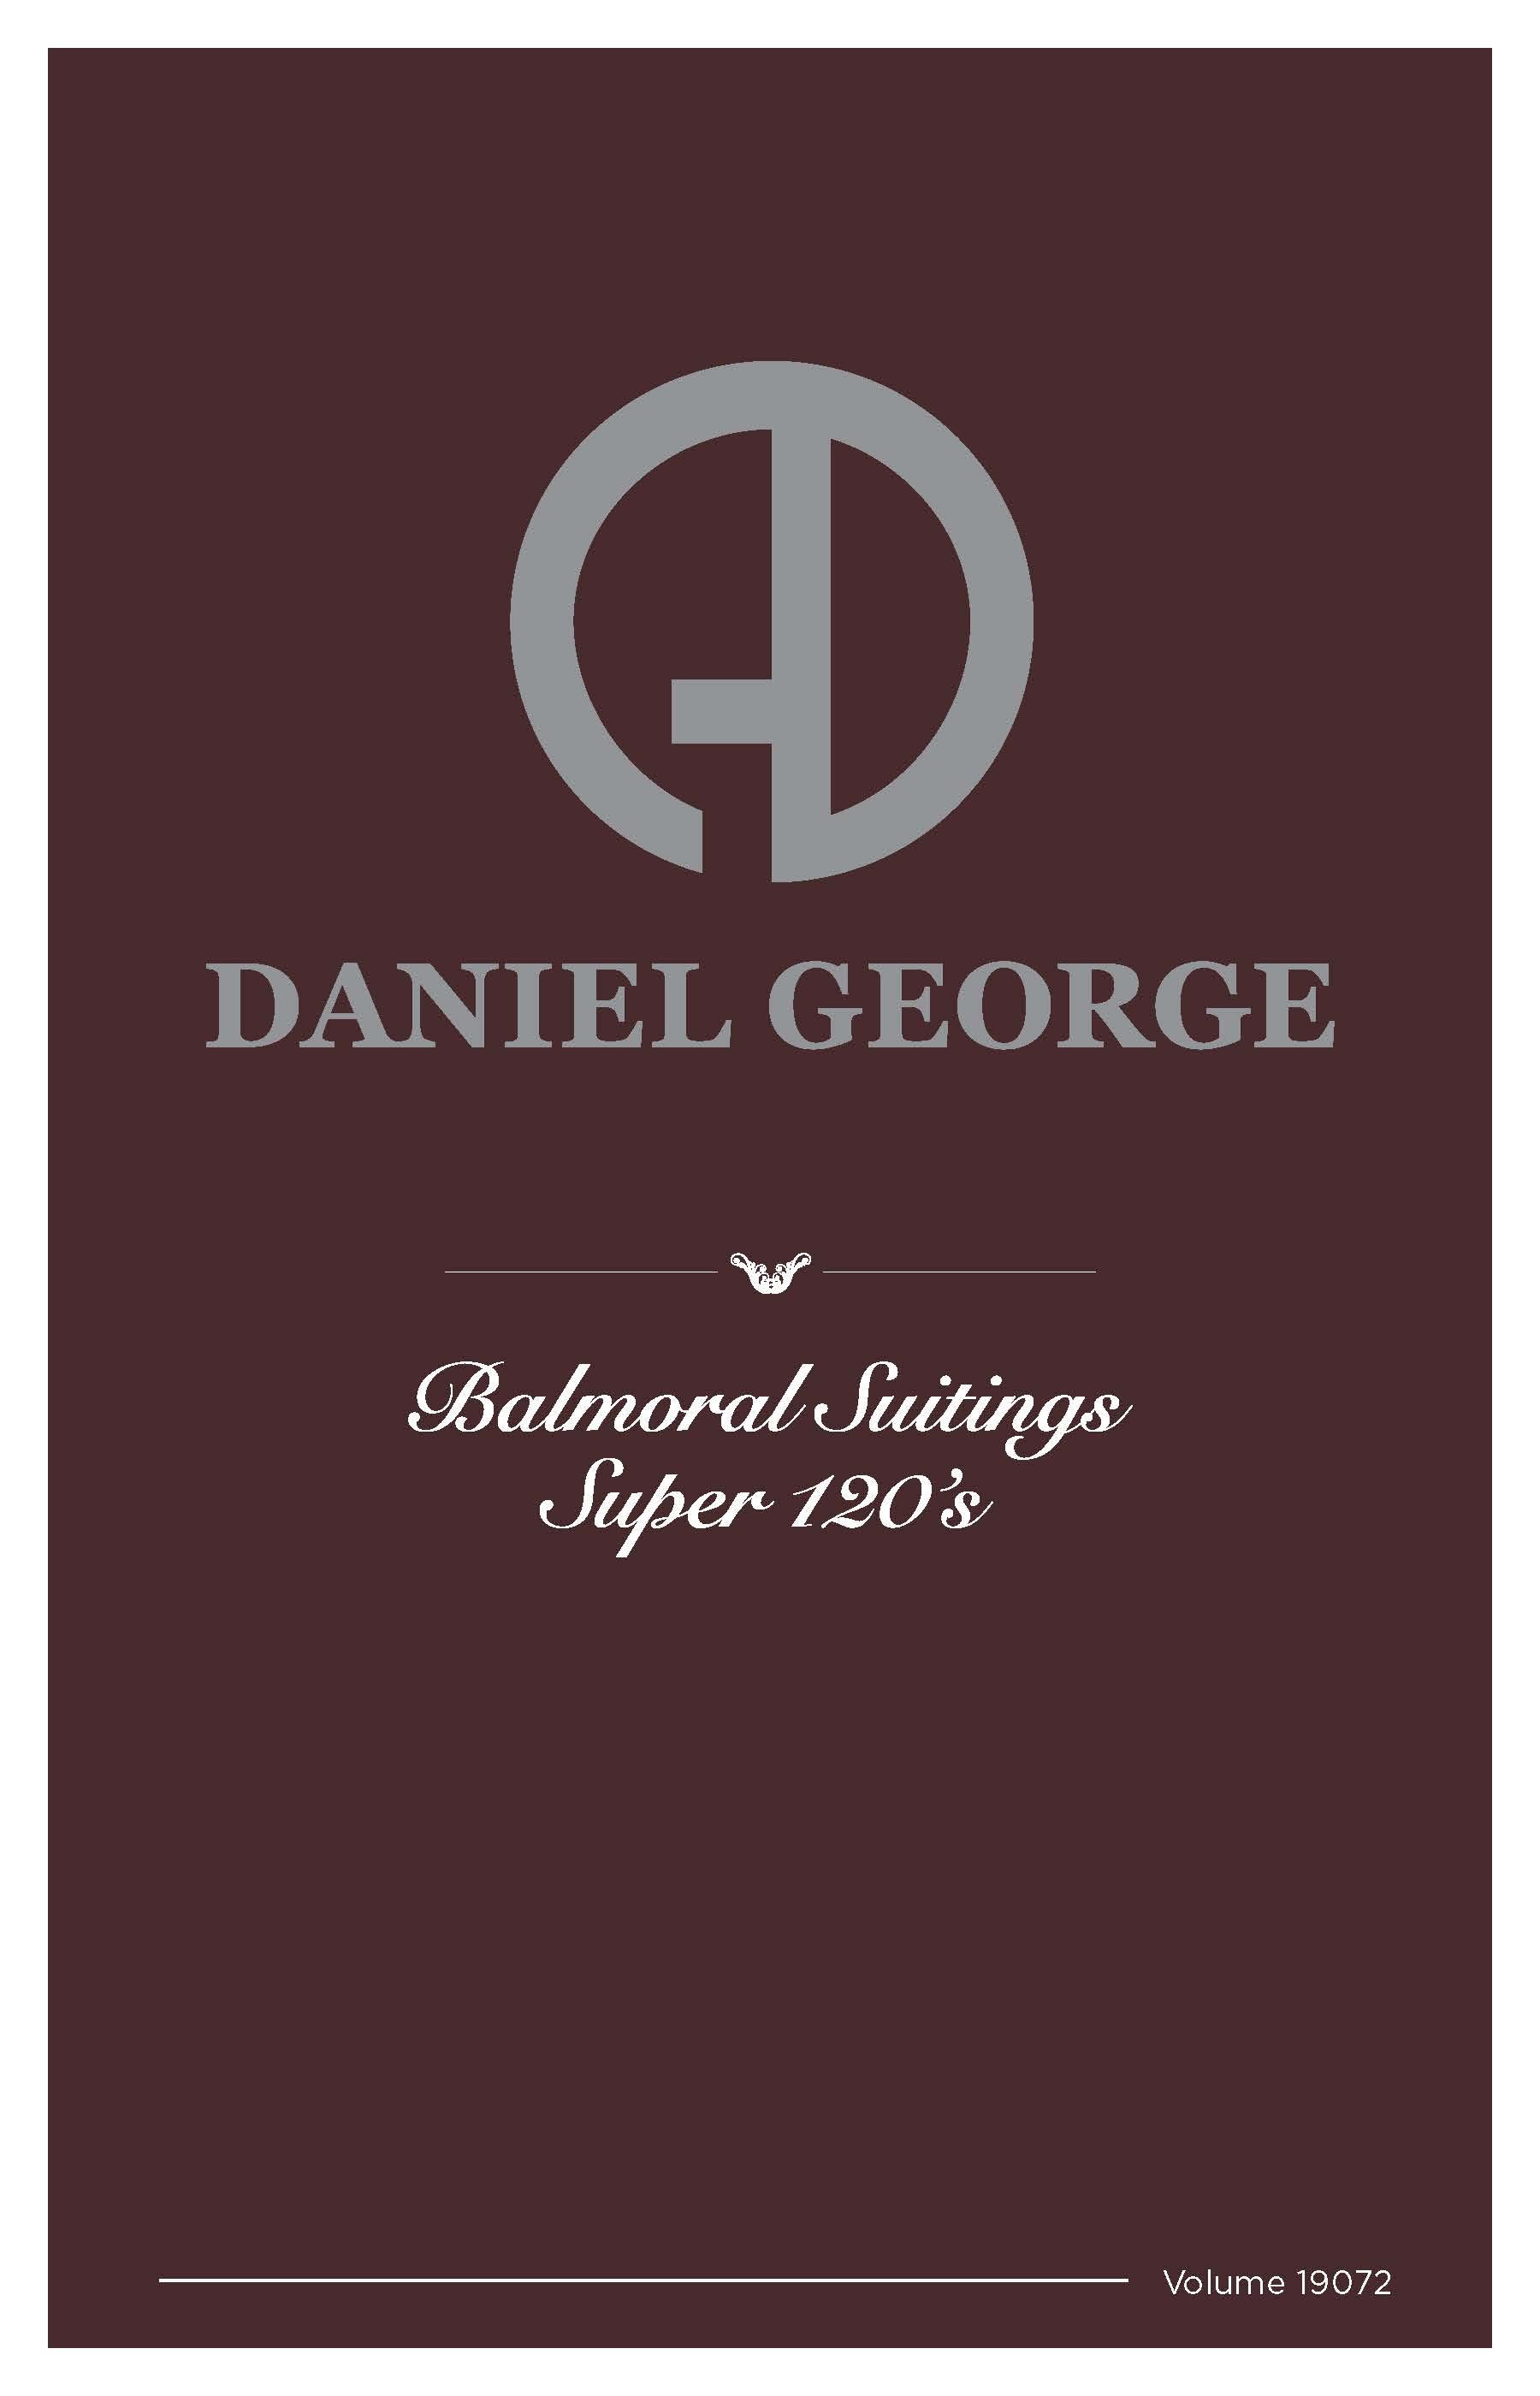 digital_collection_DG_kensington_balmoral_suitings_19072.jpg